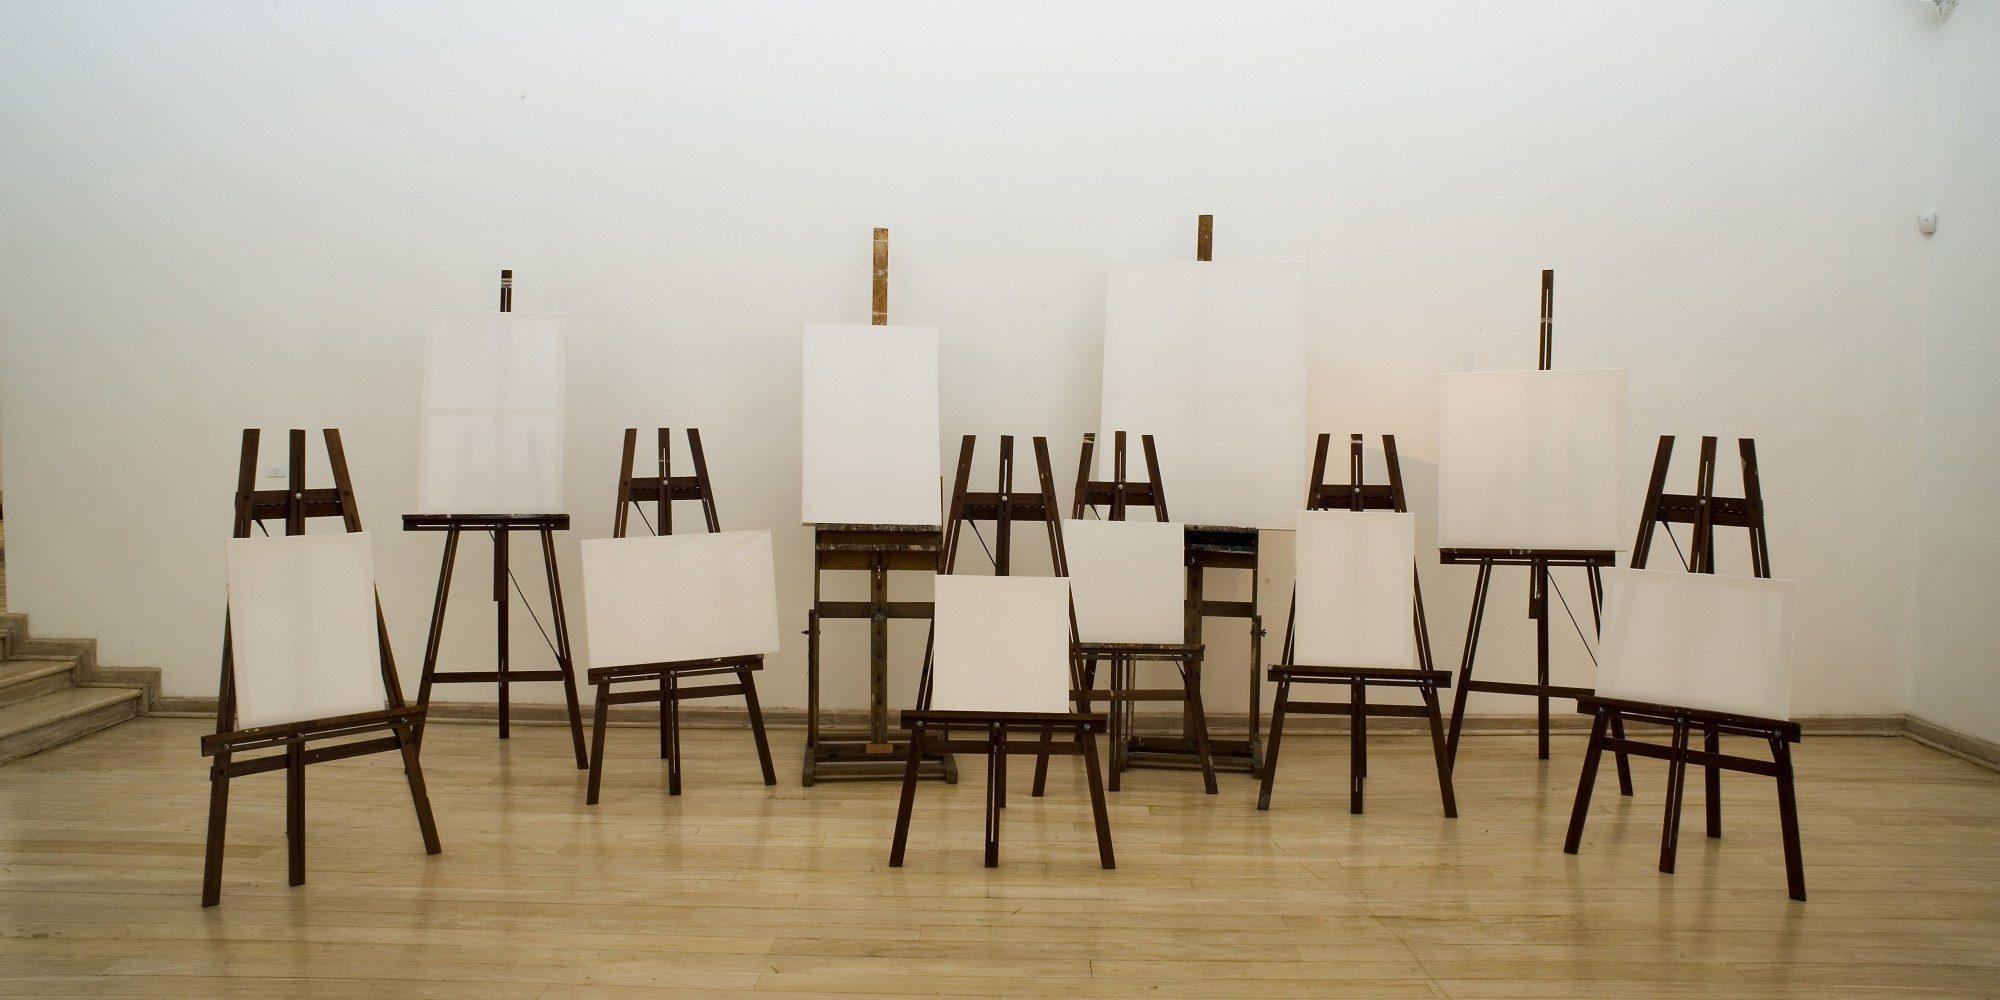 civica d'arte faruffini